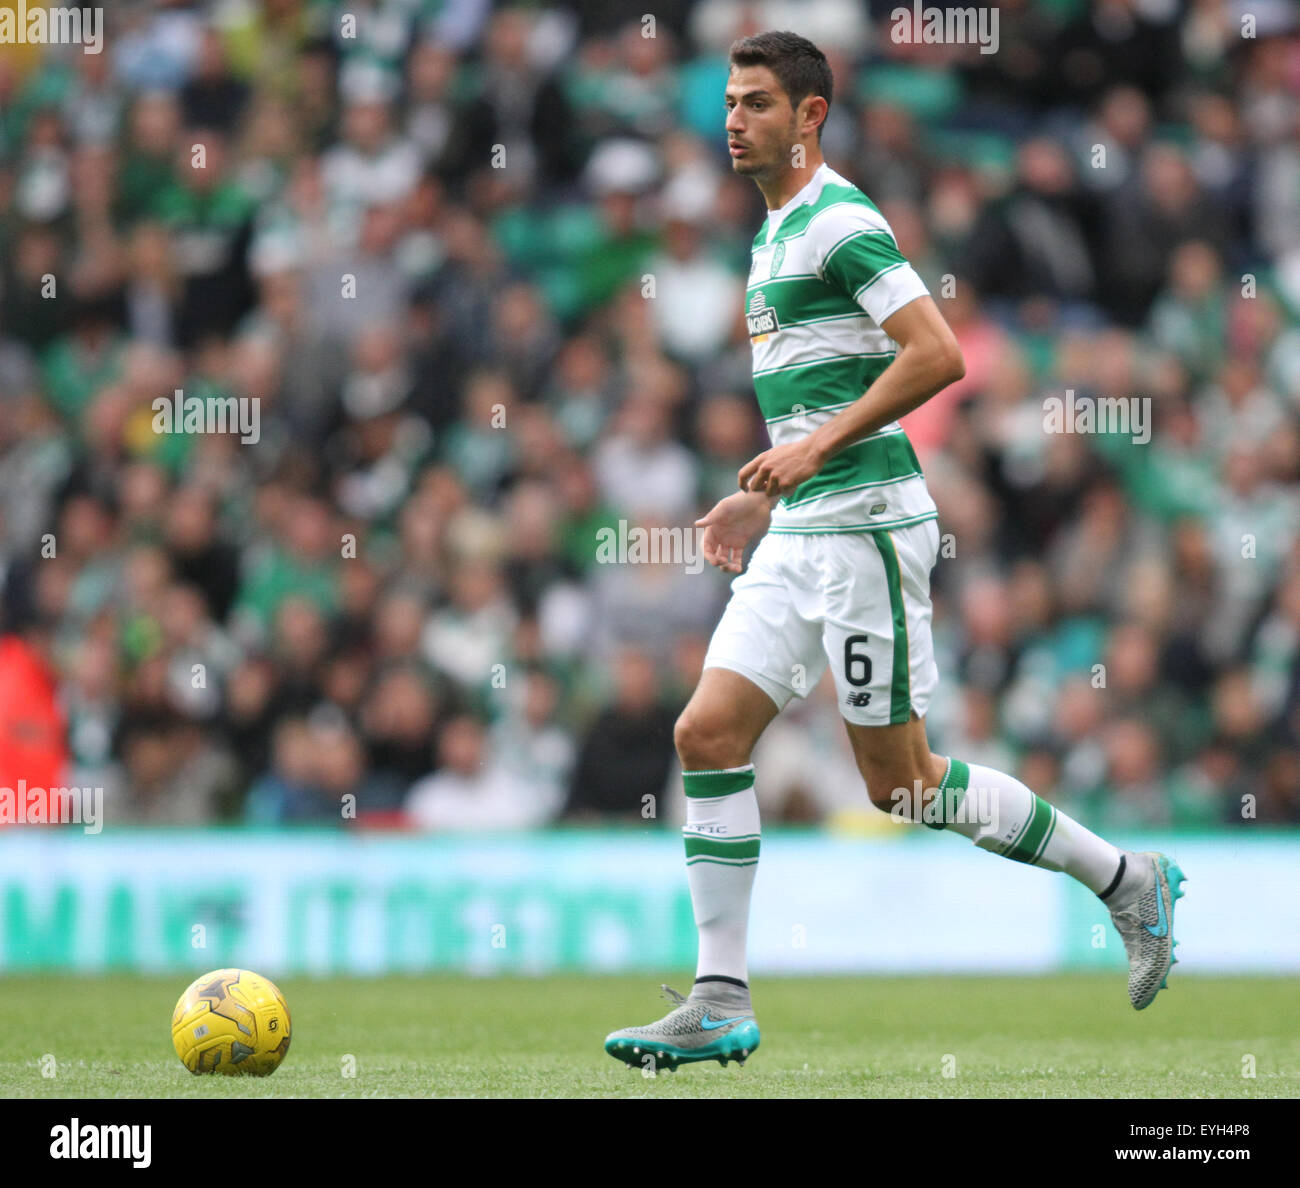 Glasgow, Scotland. 29th July, 2015. Champions League Third Qualifying Round First Leg. Celtic versus FK Qarabag. - Stock Image